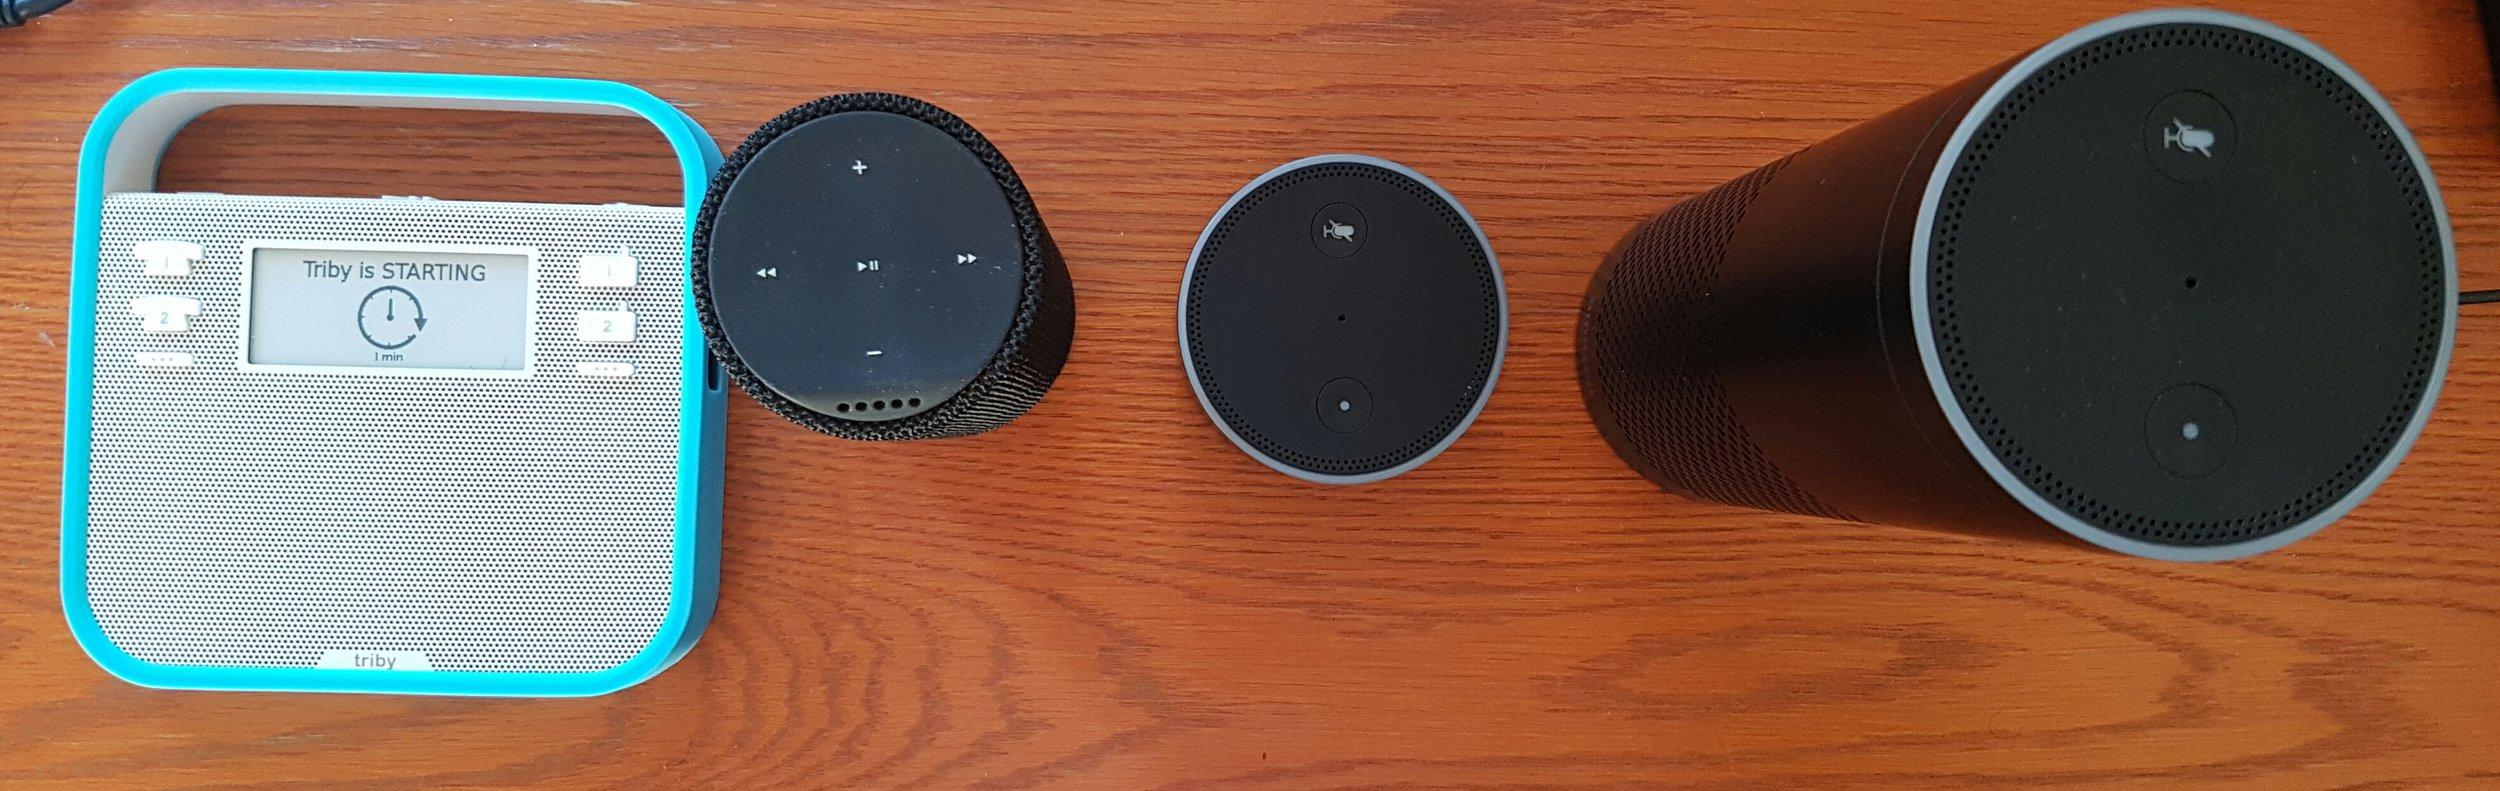 Triby, Amazon's Tap, Dot & Echo